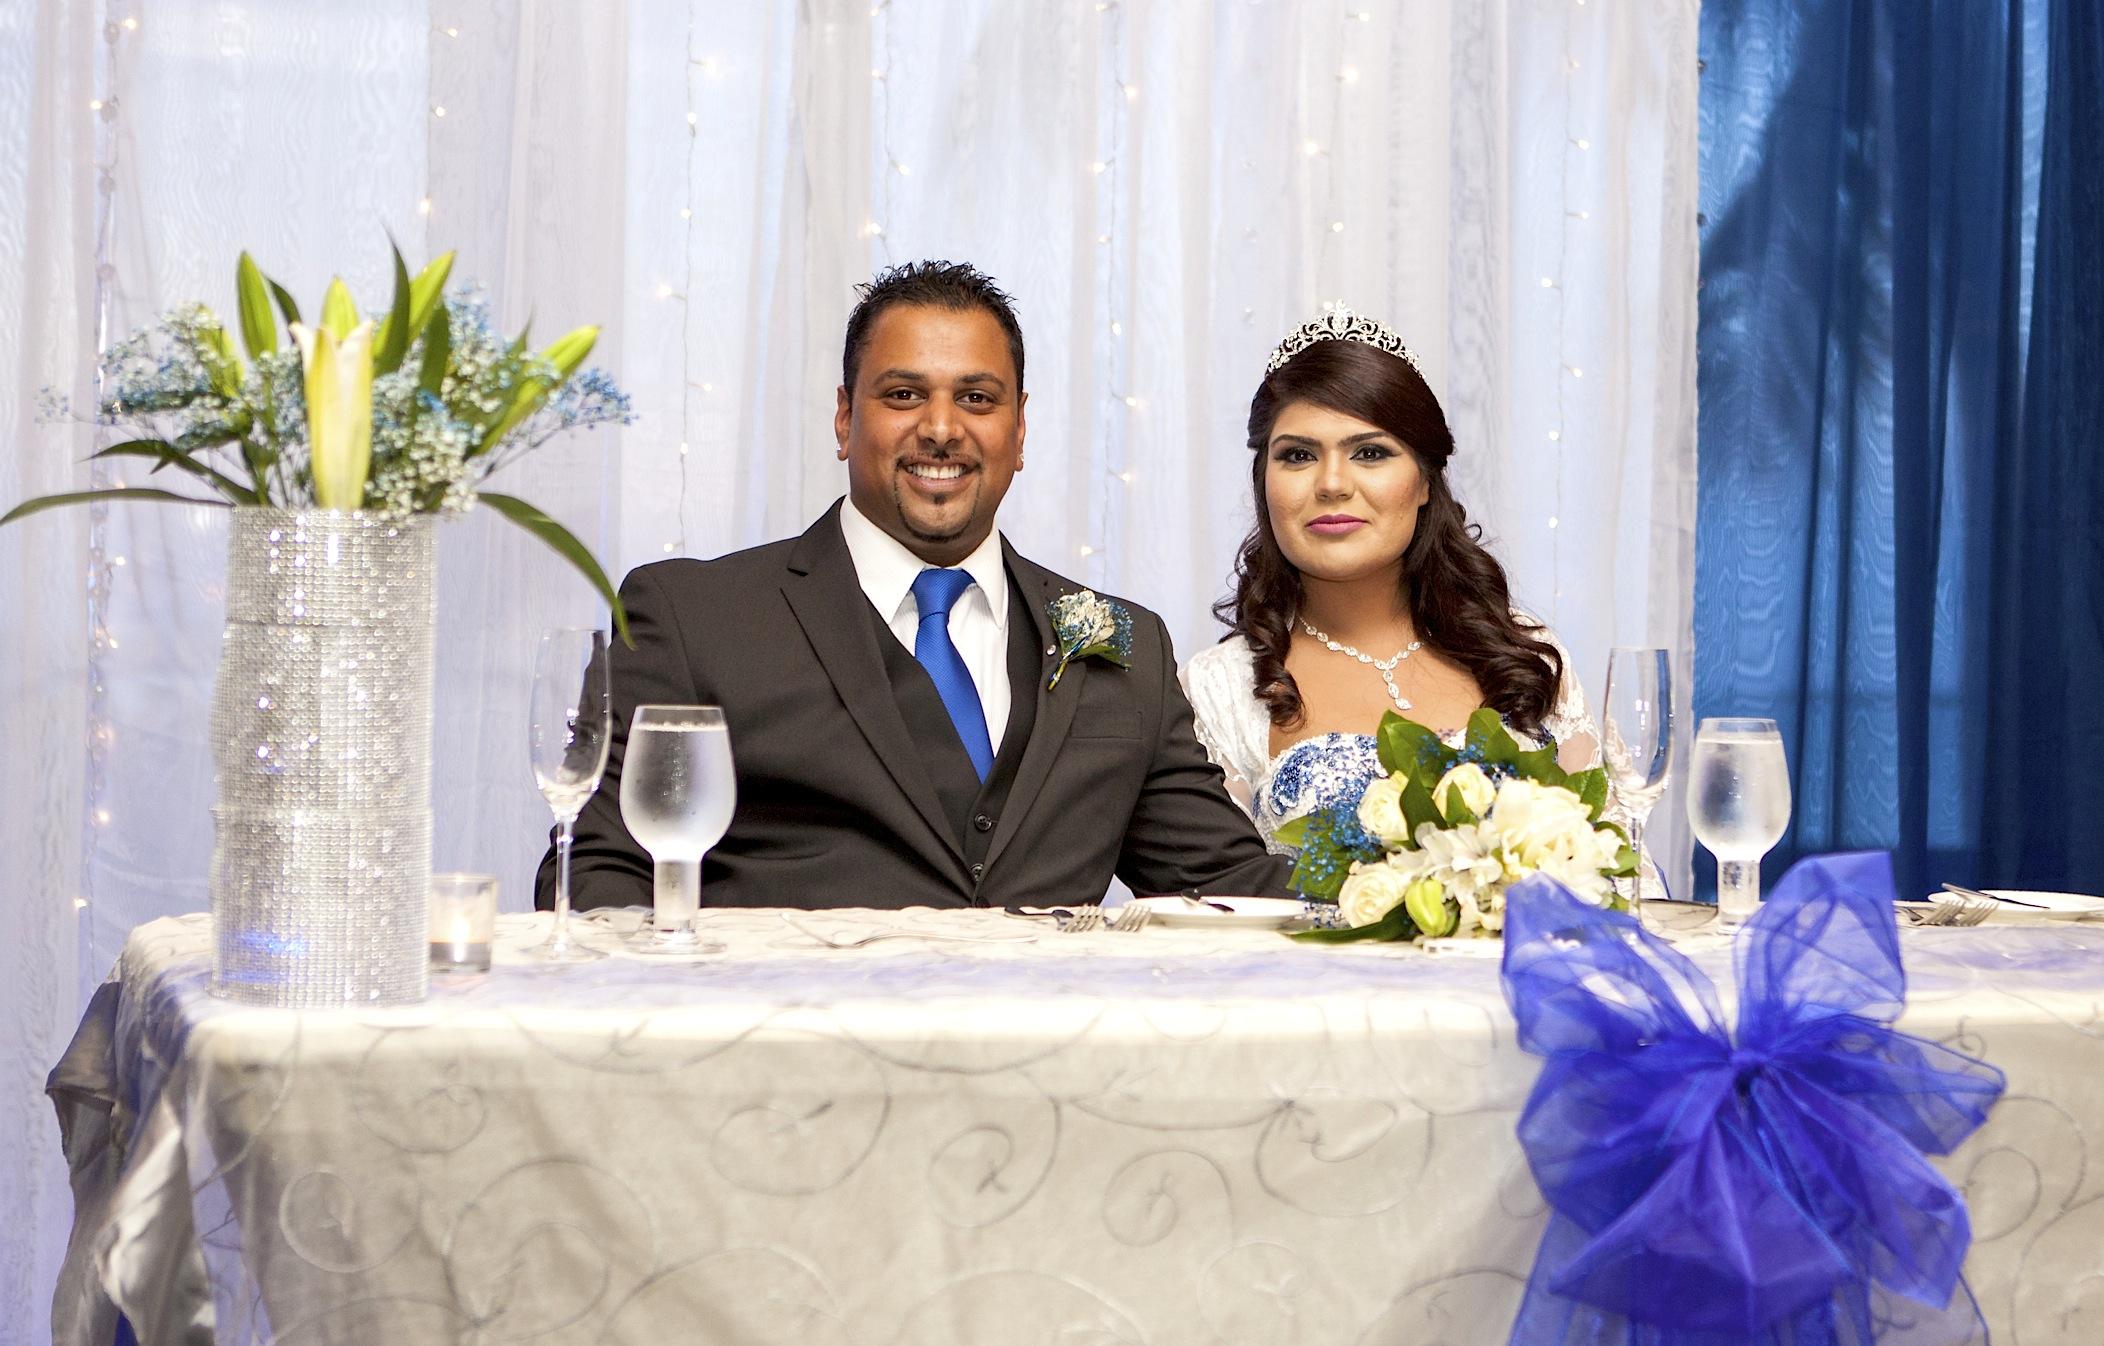 H+&+S+wedding+2-41.jpg